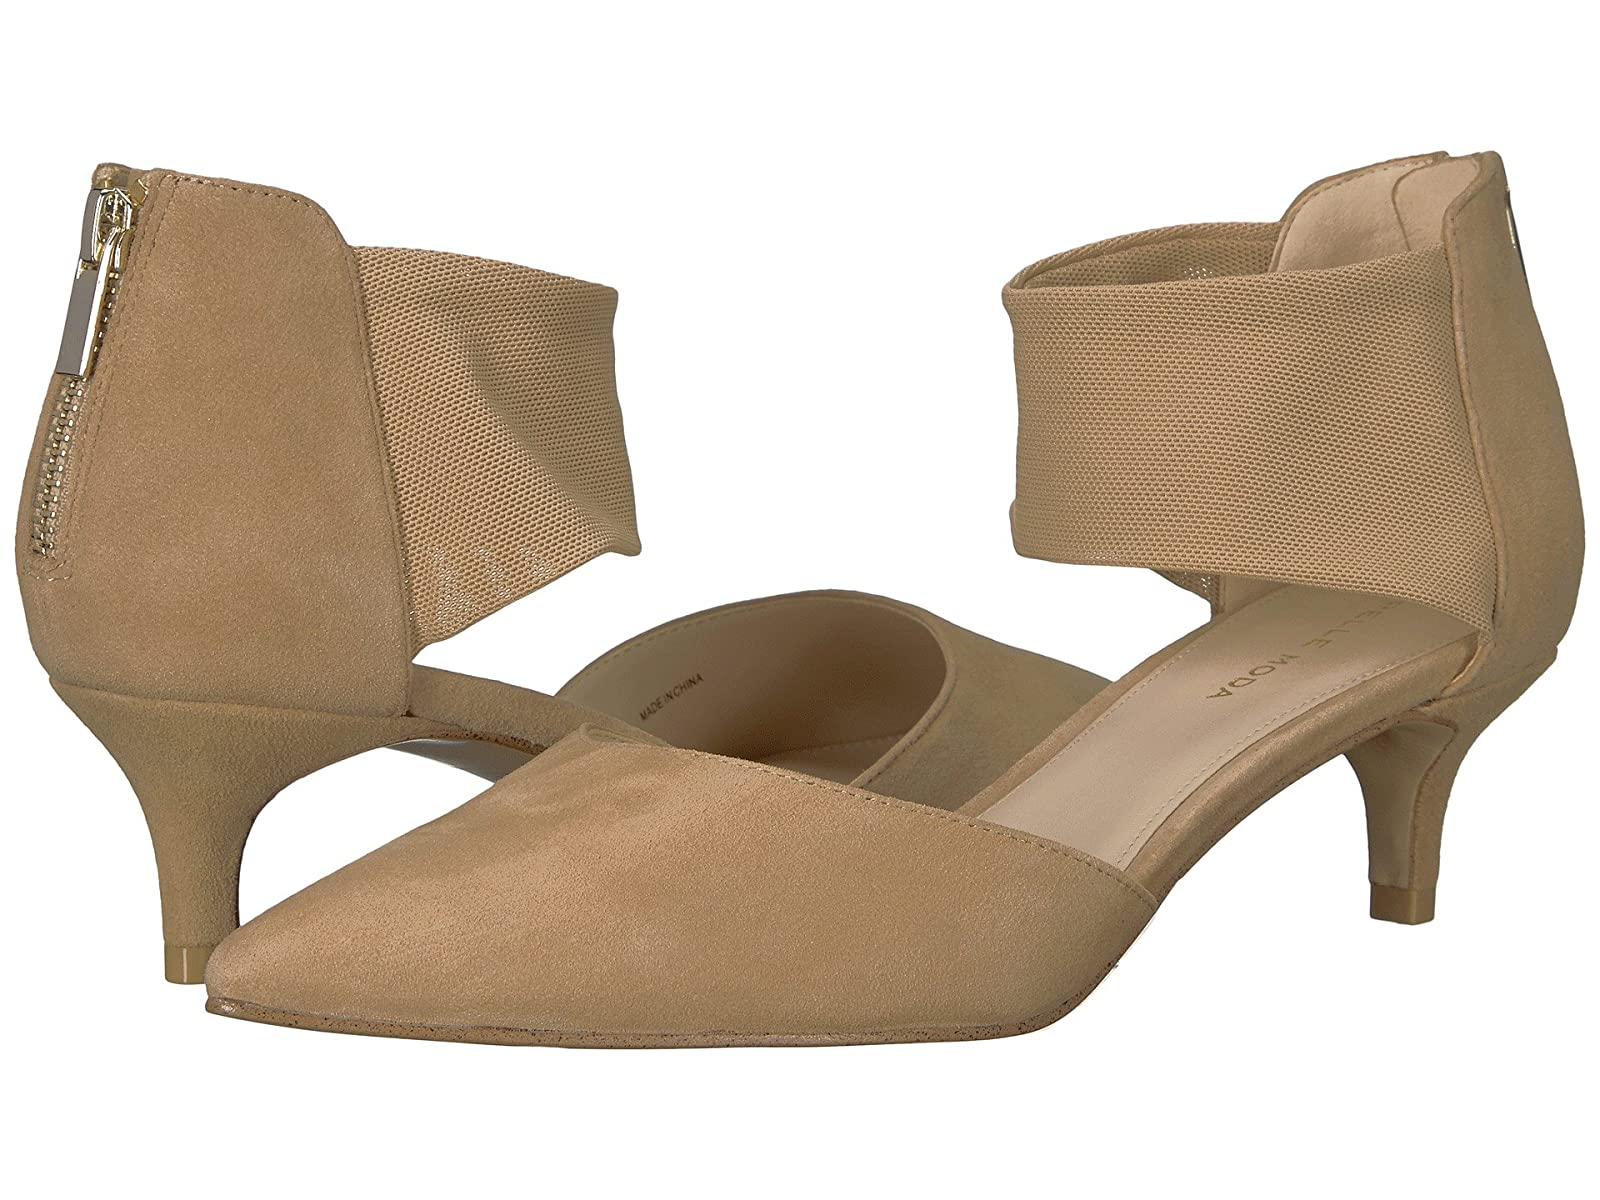 Pelle Moda DeziAtmospheric grades have affordable shoes